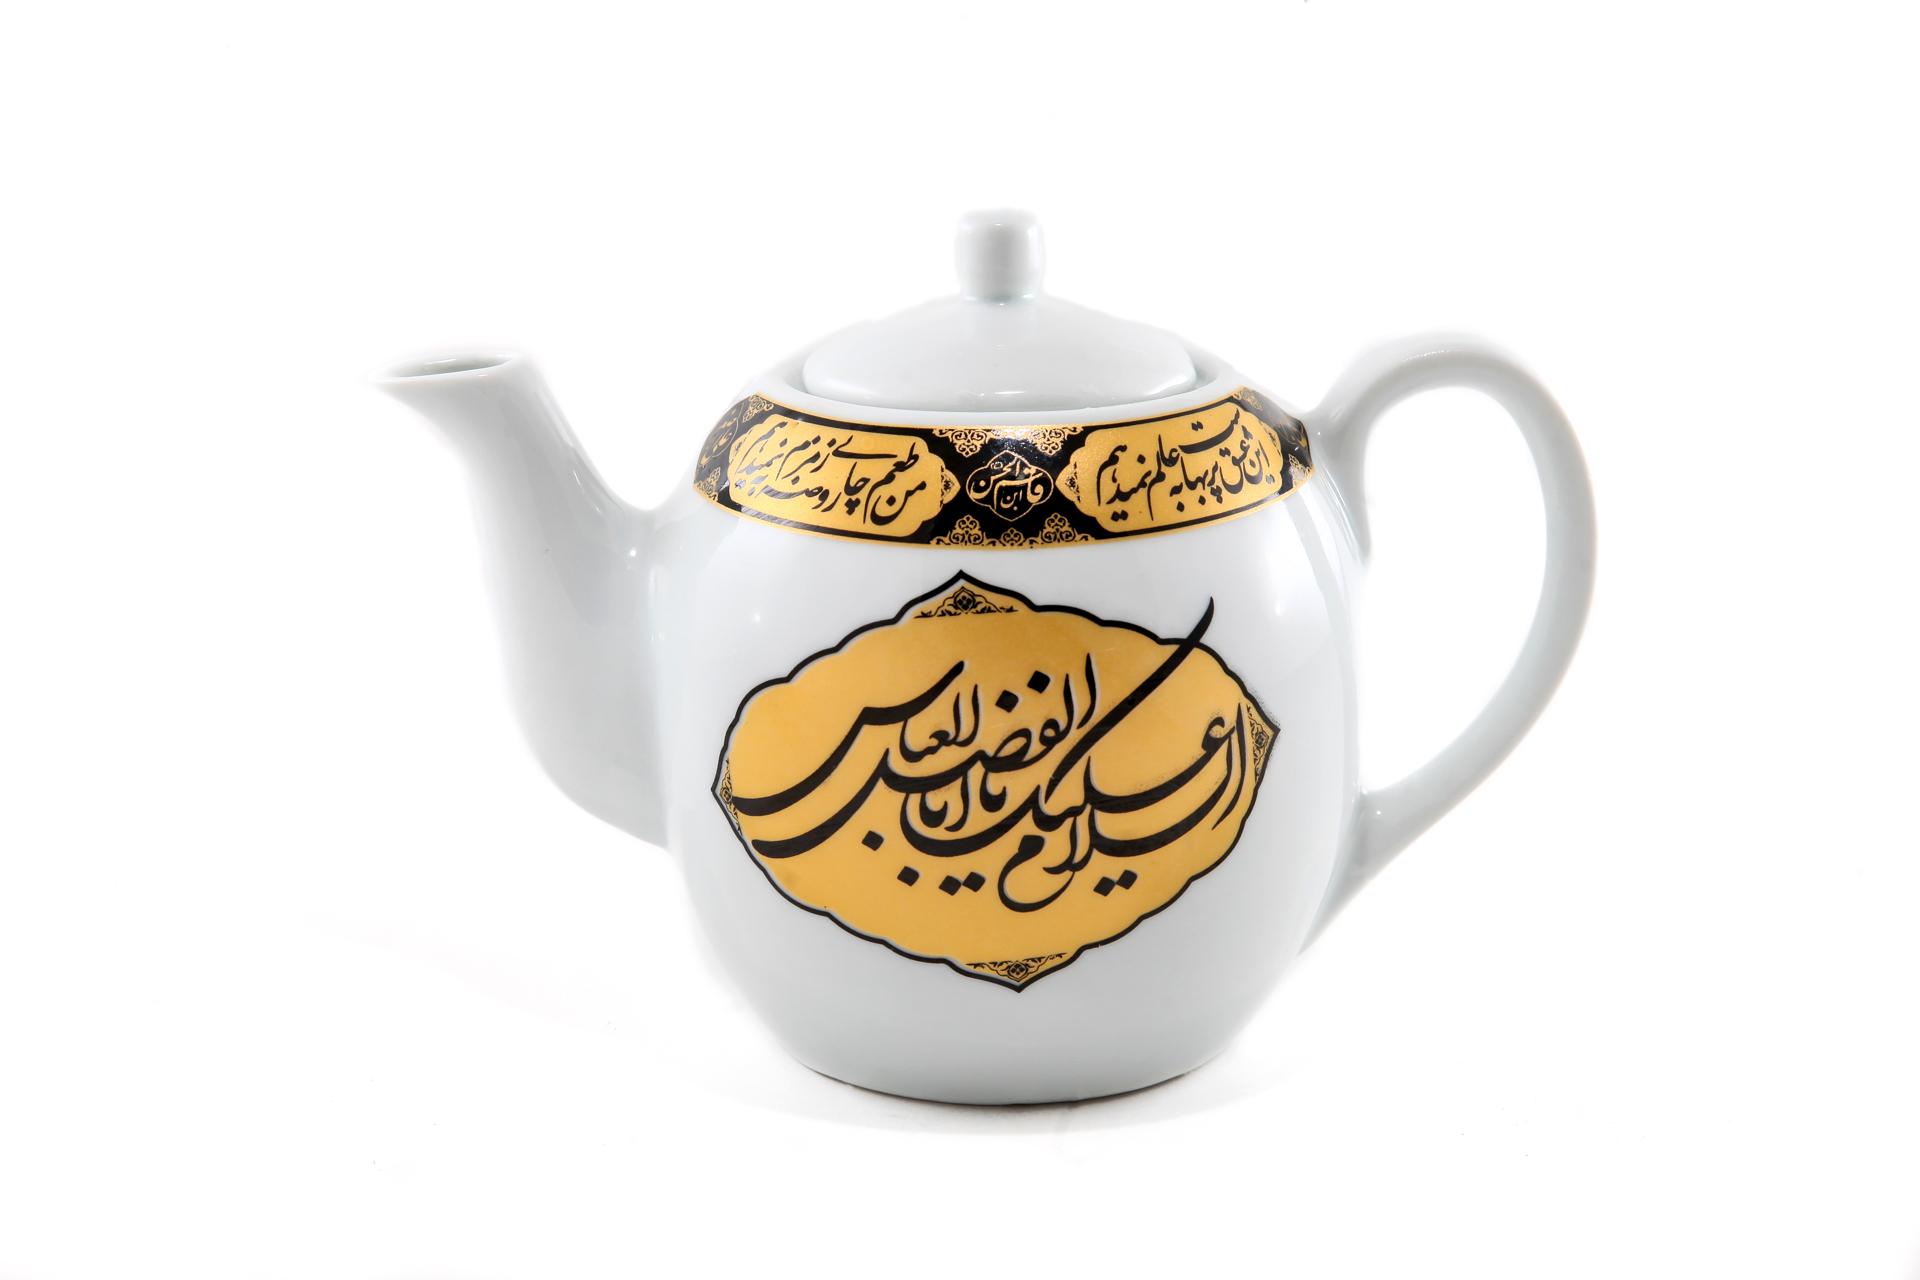 تصویر از قوری چایخانه با ذکر السلام علیک یا اباعبدالله الحسین (ع) و السلام علیک یا ابالفضل العباس(ع) 1 لیتری